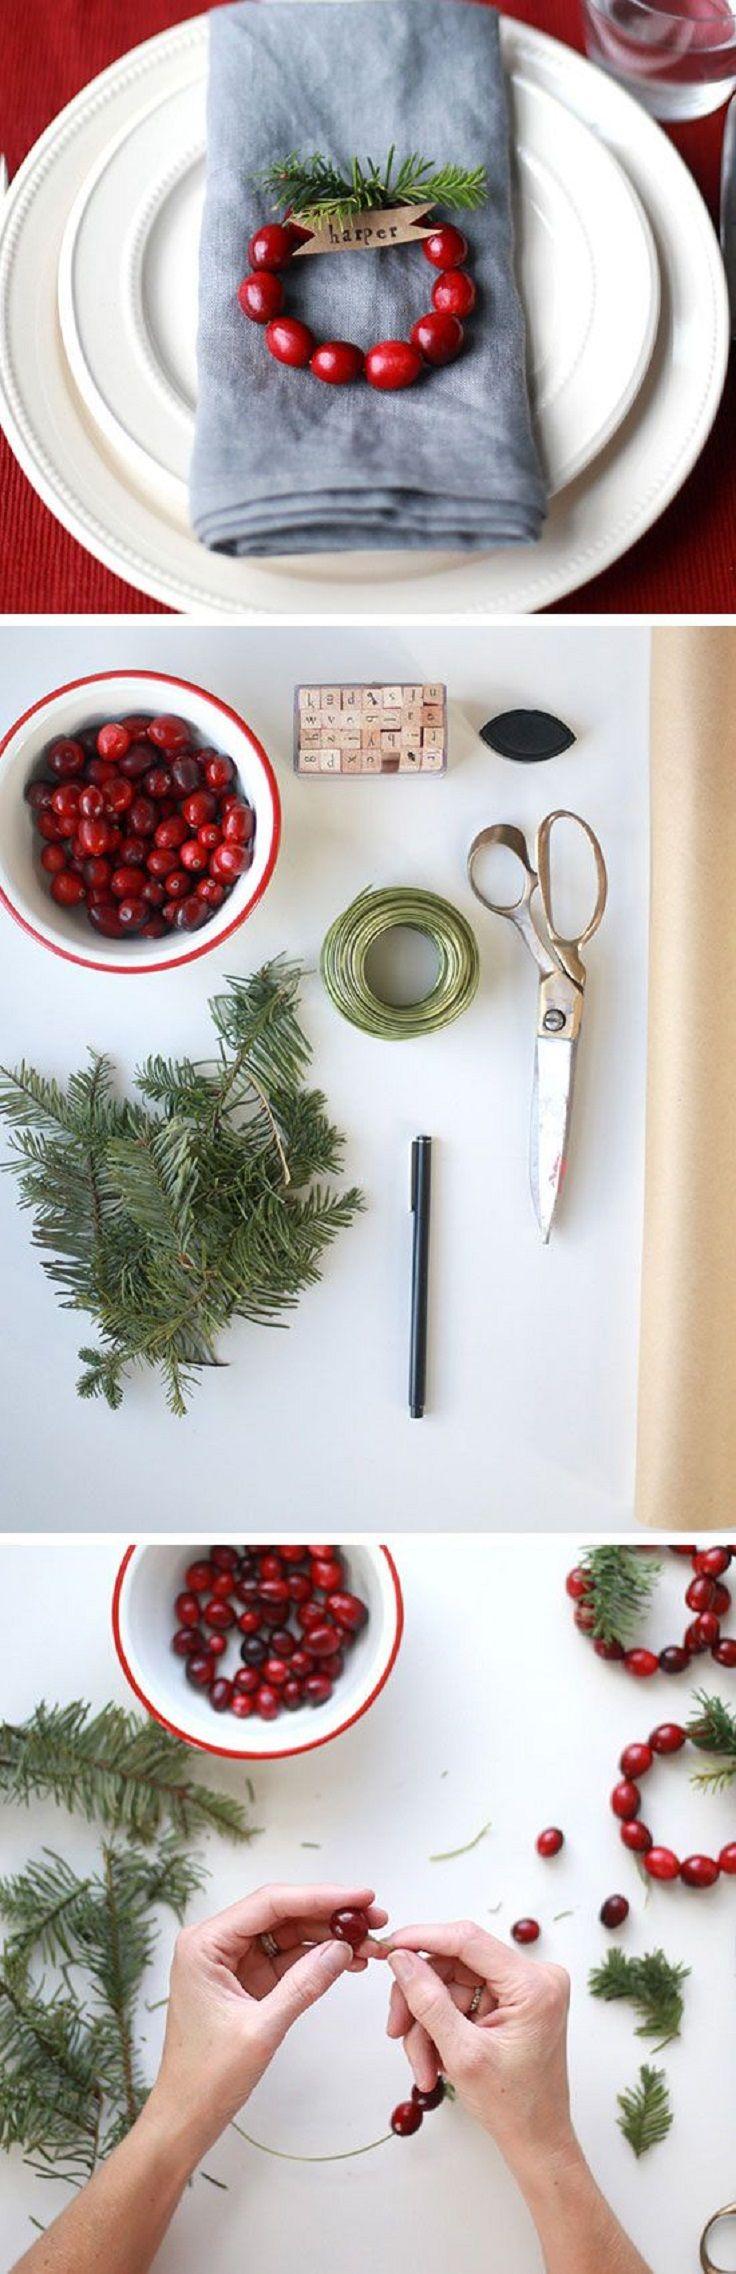 DIY Mini Cranberry Wreath Place Cards - 15 Gracious Christmas DIY Table Decorations